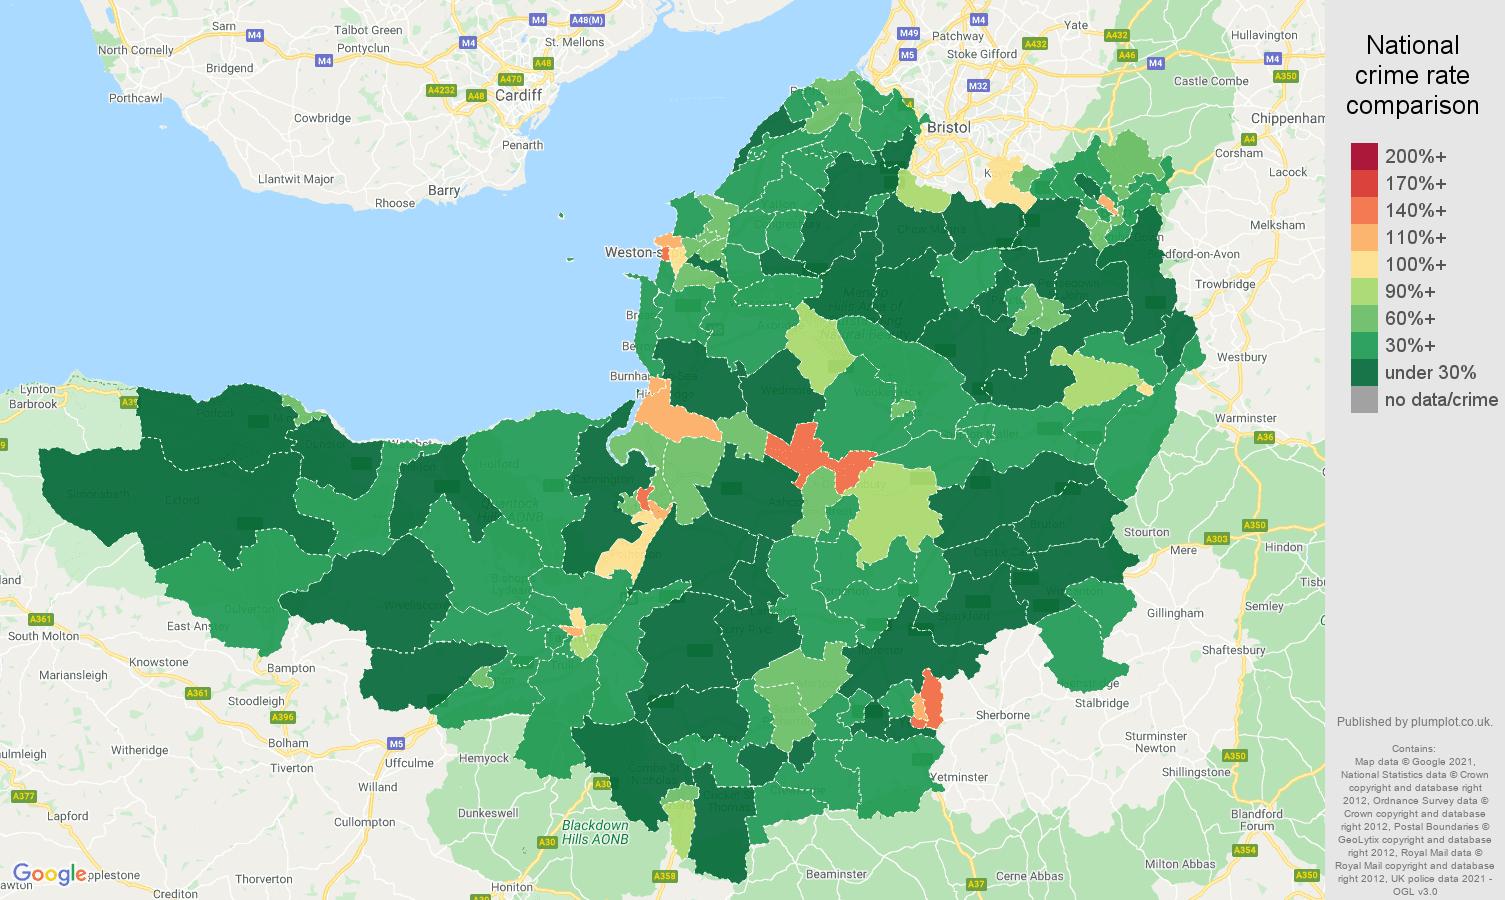 Somerset antisocial behaviour crime rate comparison map